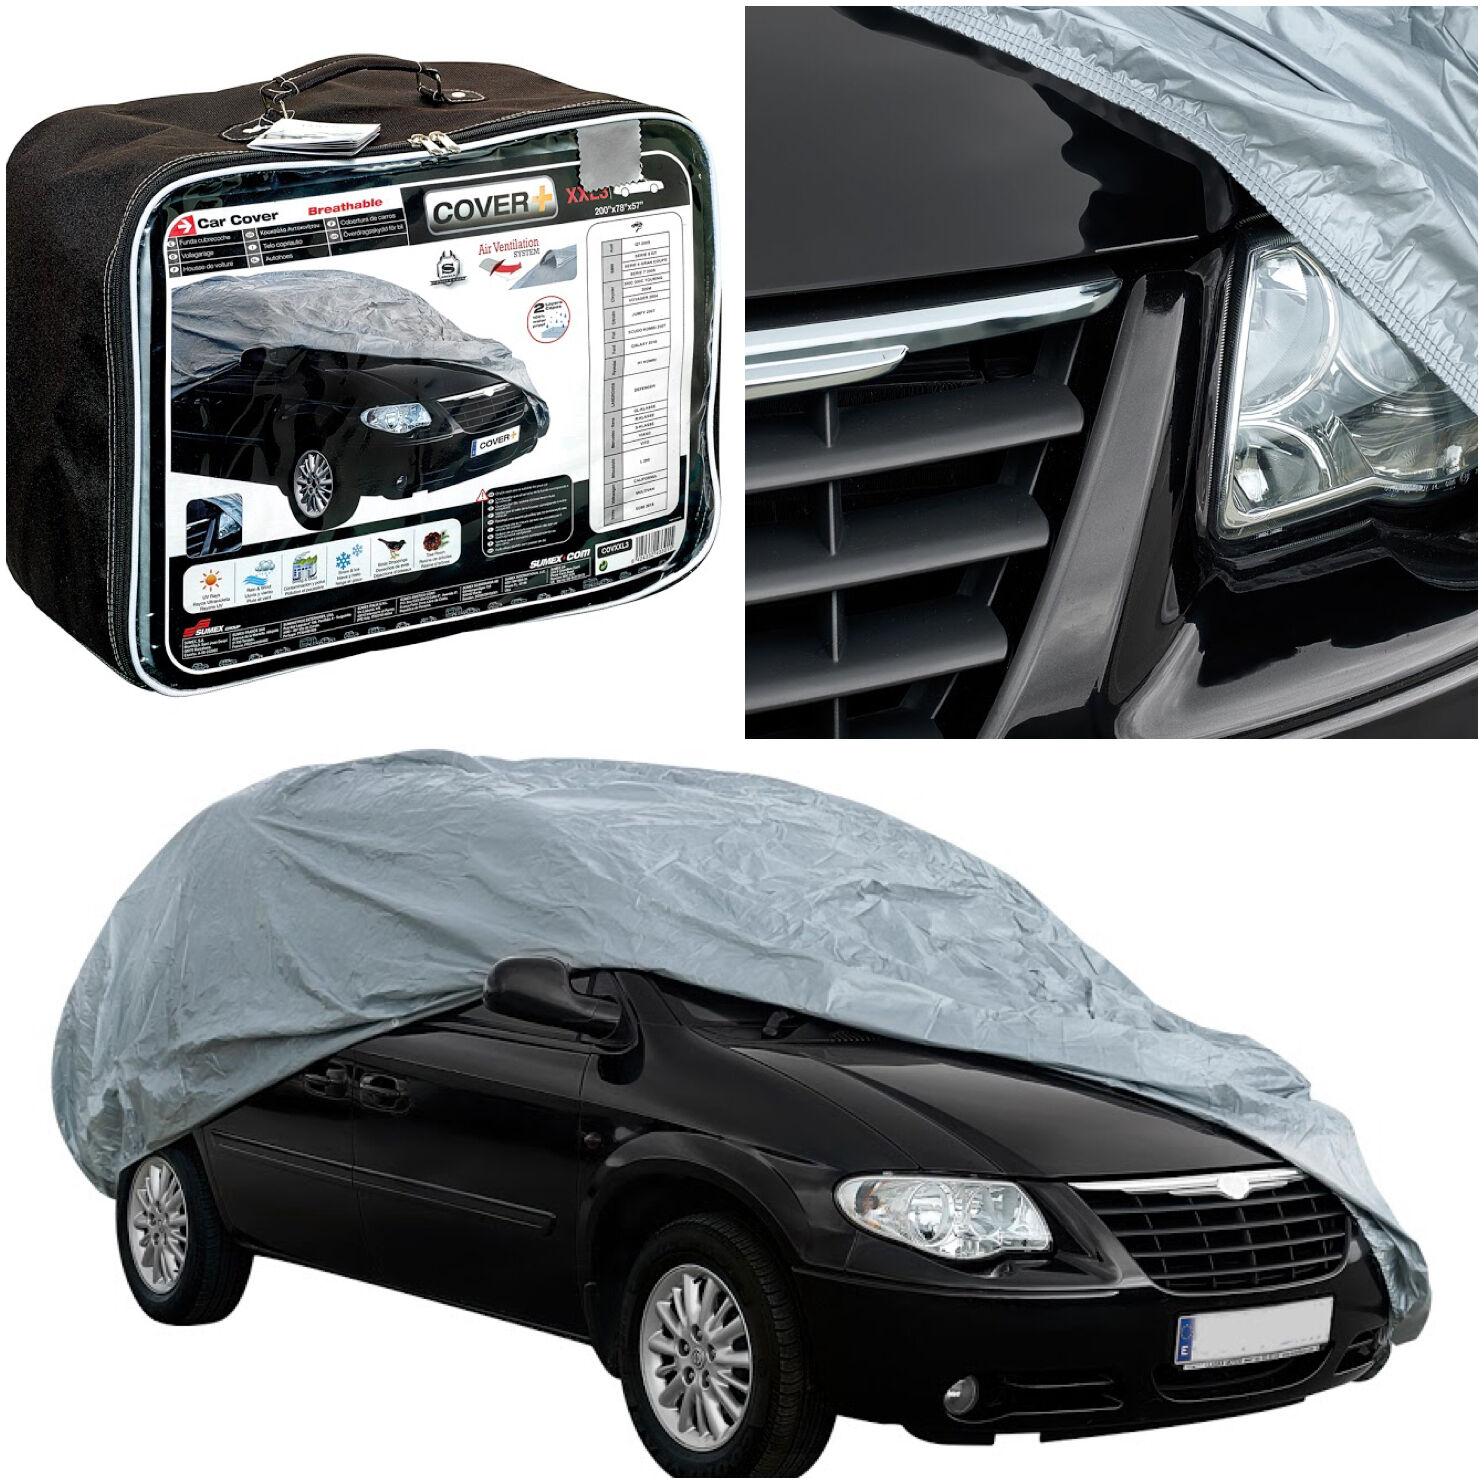 Exterior & Body Parts , Car Parts , Vehicle Parts & Accessories